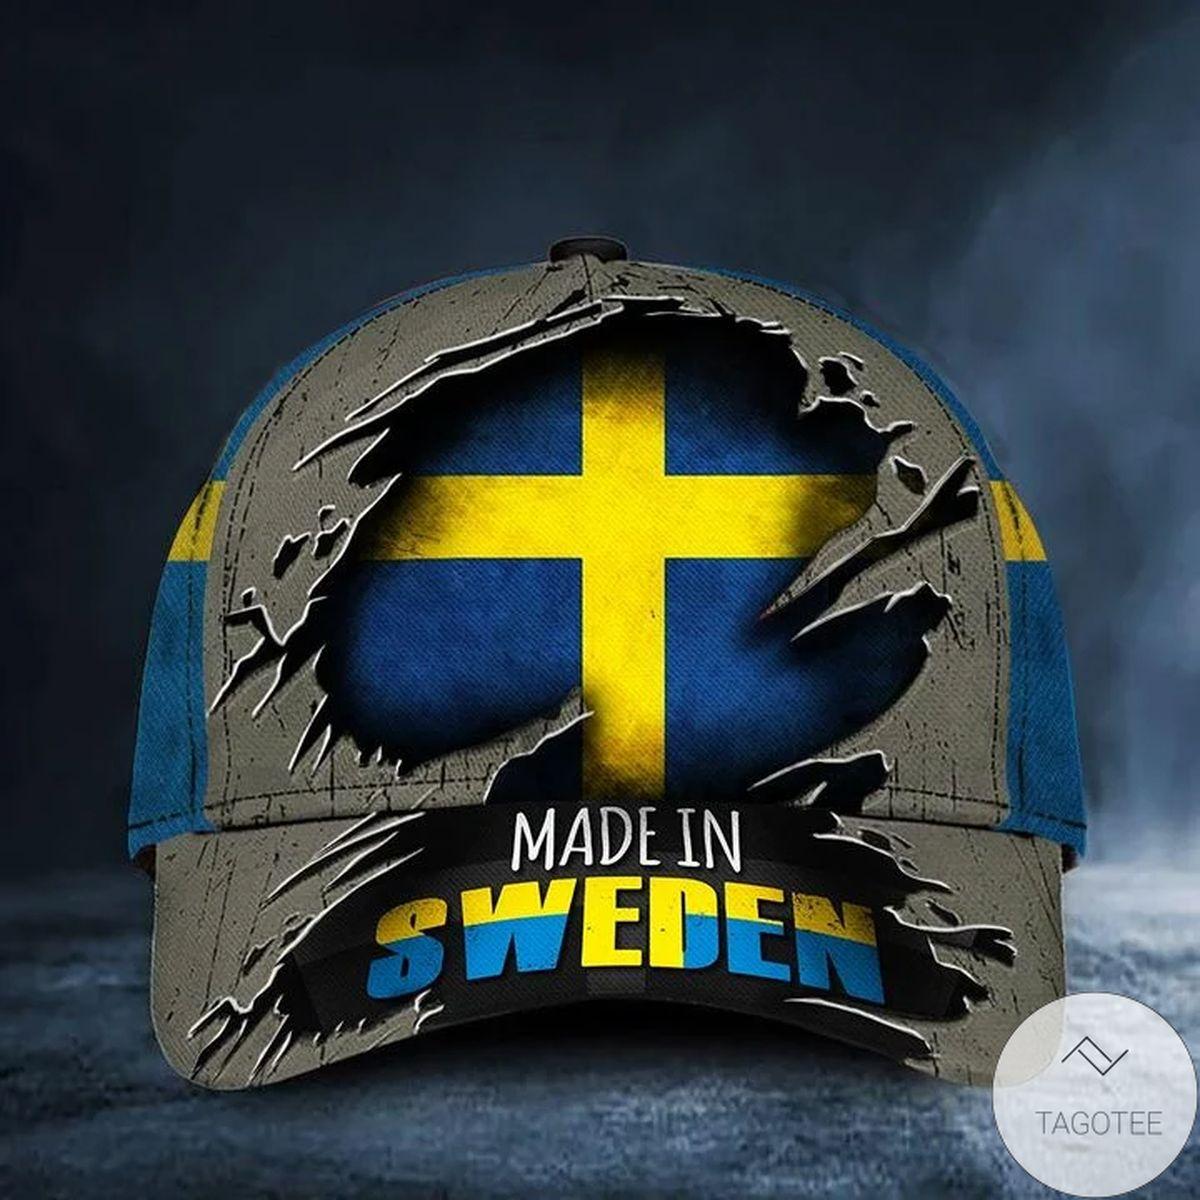 Made In Sweden Cap Sweden Flag Old Retro Hat Unique Proud Hornor Swedish Gift Merch